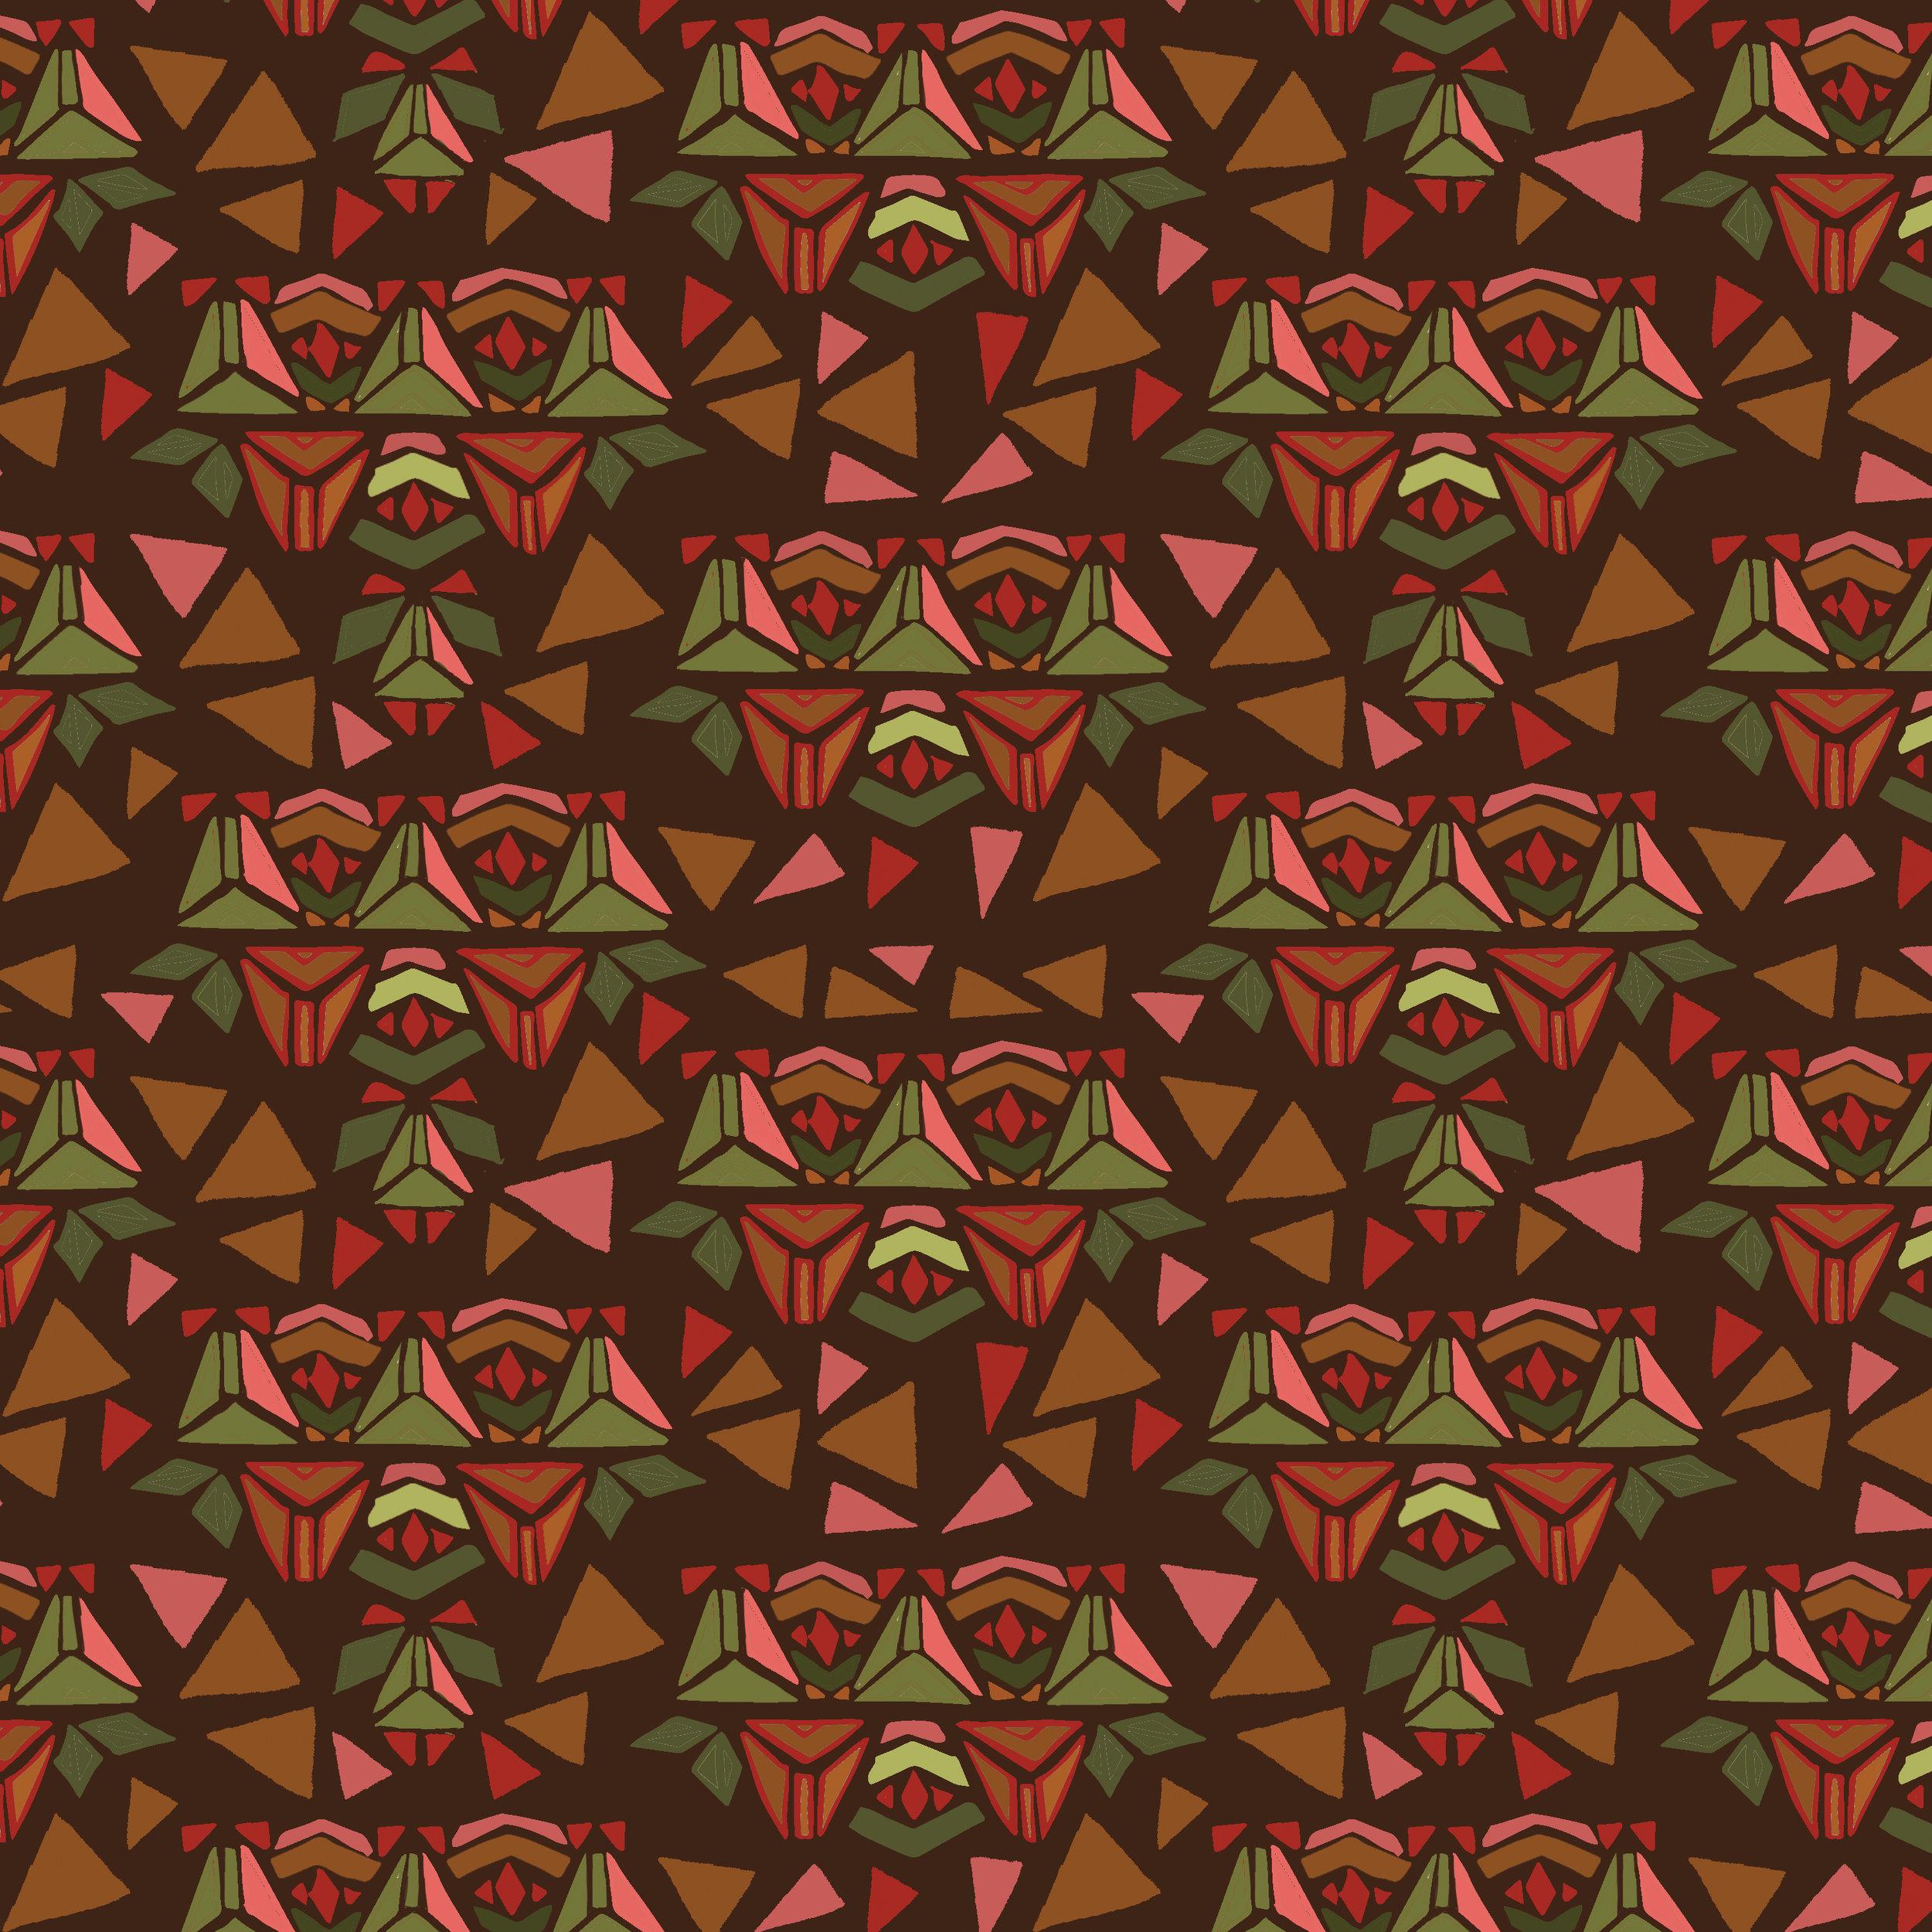 AFRICAN MAIN(6inchx6inch) RGB.jpg